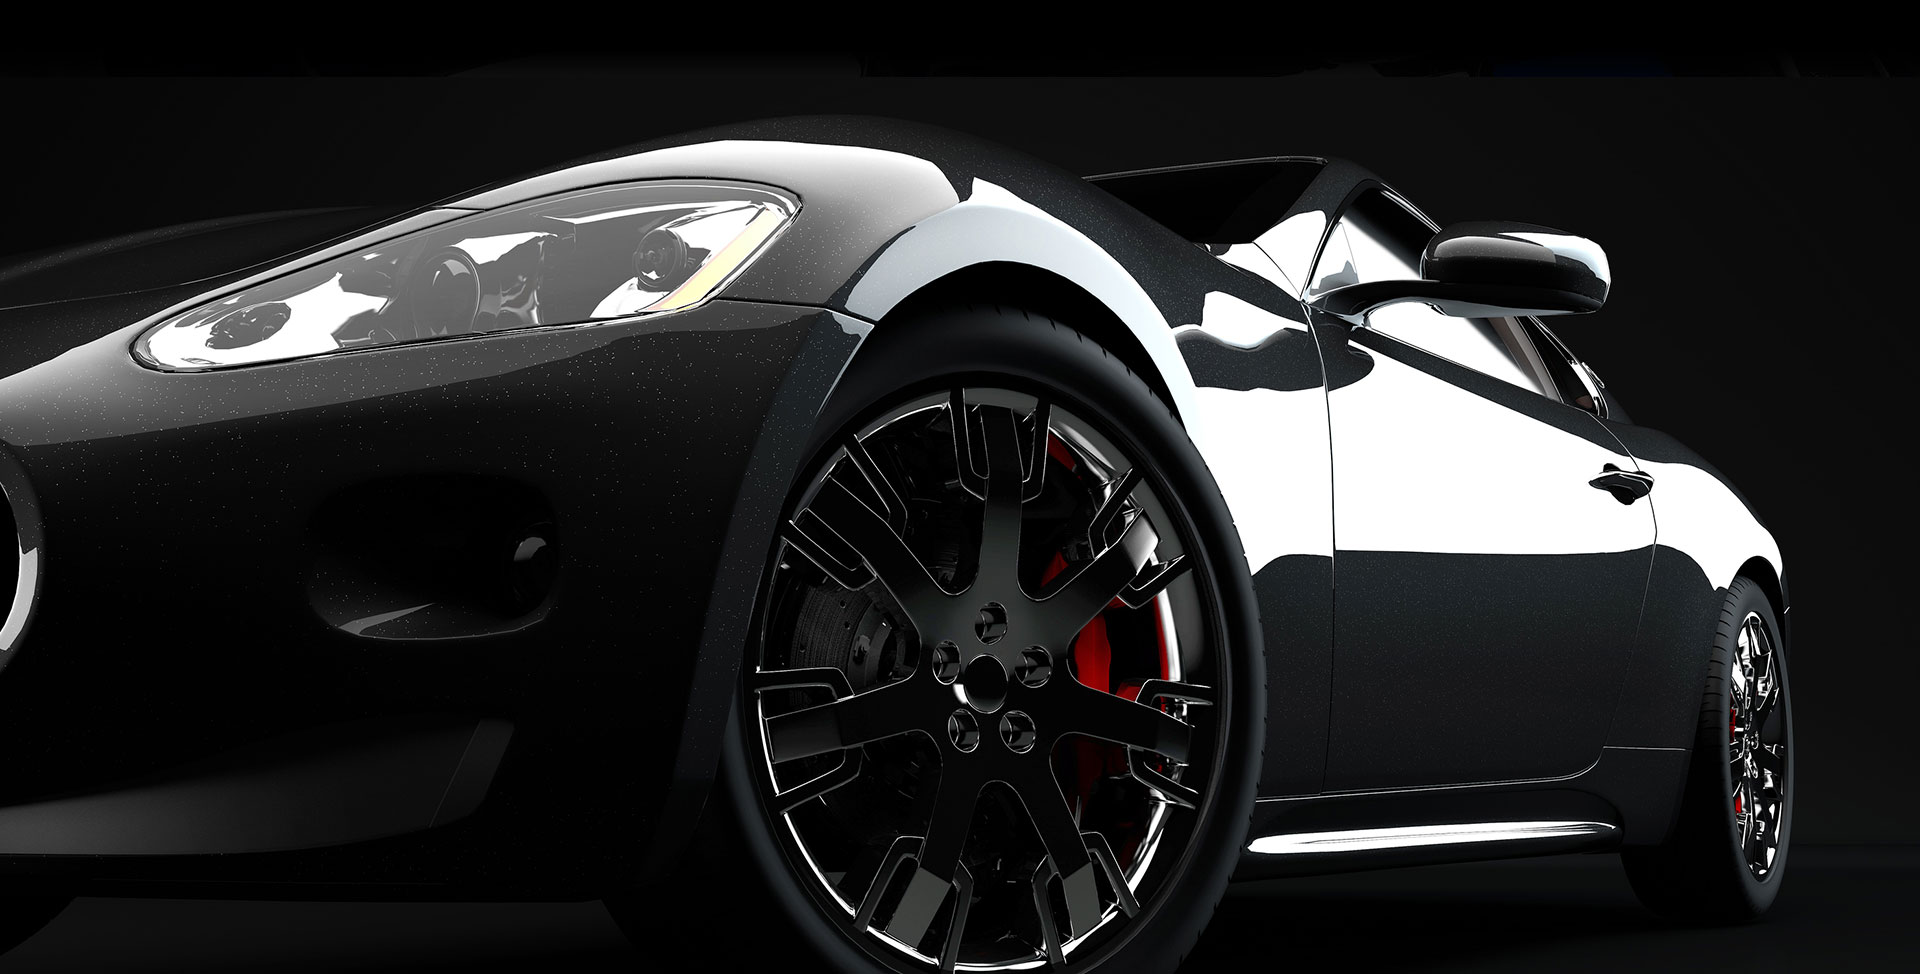 Temecula Car Wash And Detail